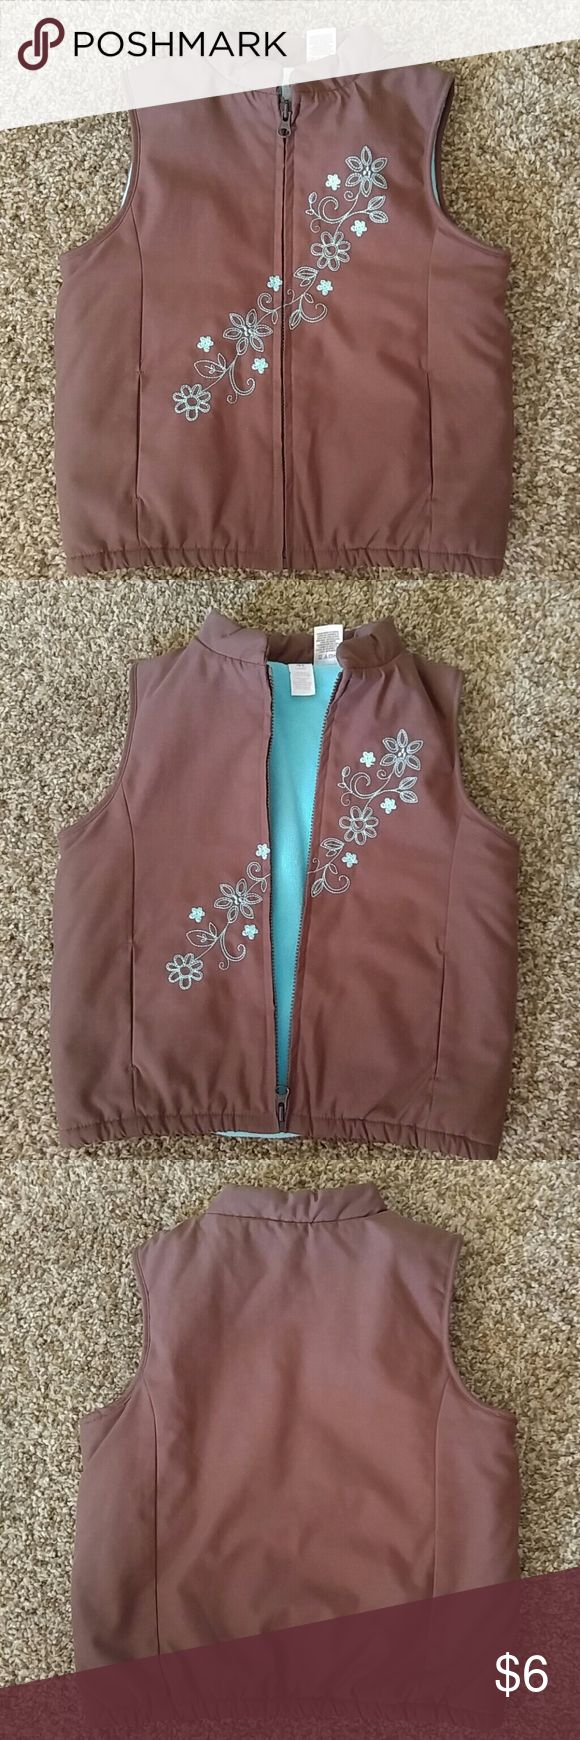 4T Brown Vest GUC Brown vest with blue floral stitching. Carter's Jackets & Coats Vests